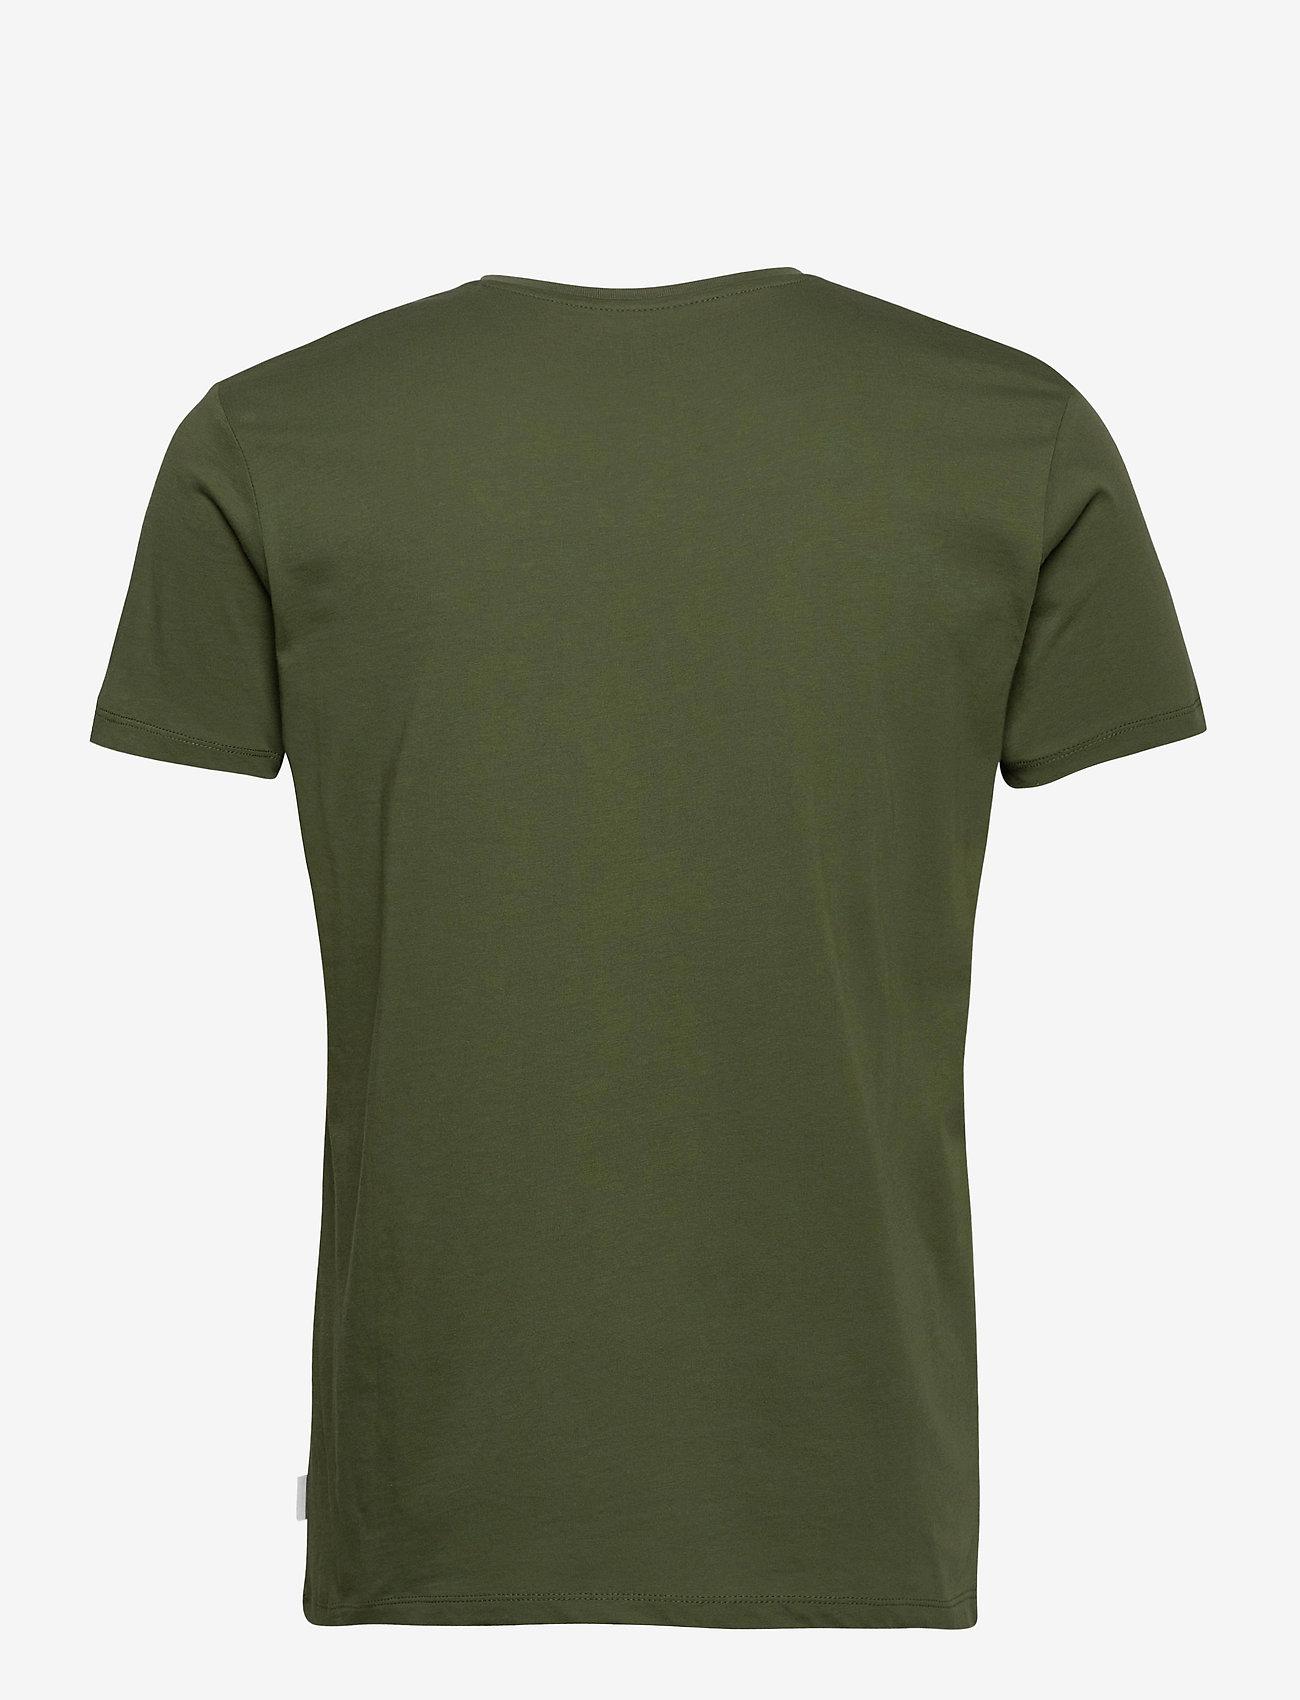 Esprit Casual - T-Shirts - basic t-shirts - khaki green - 1